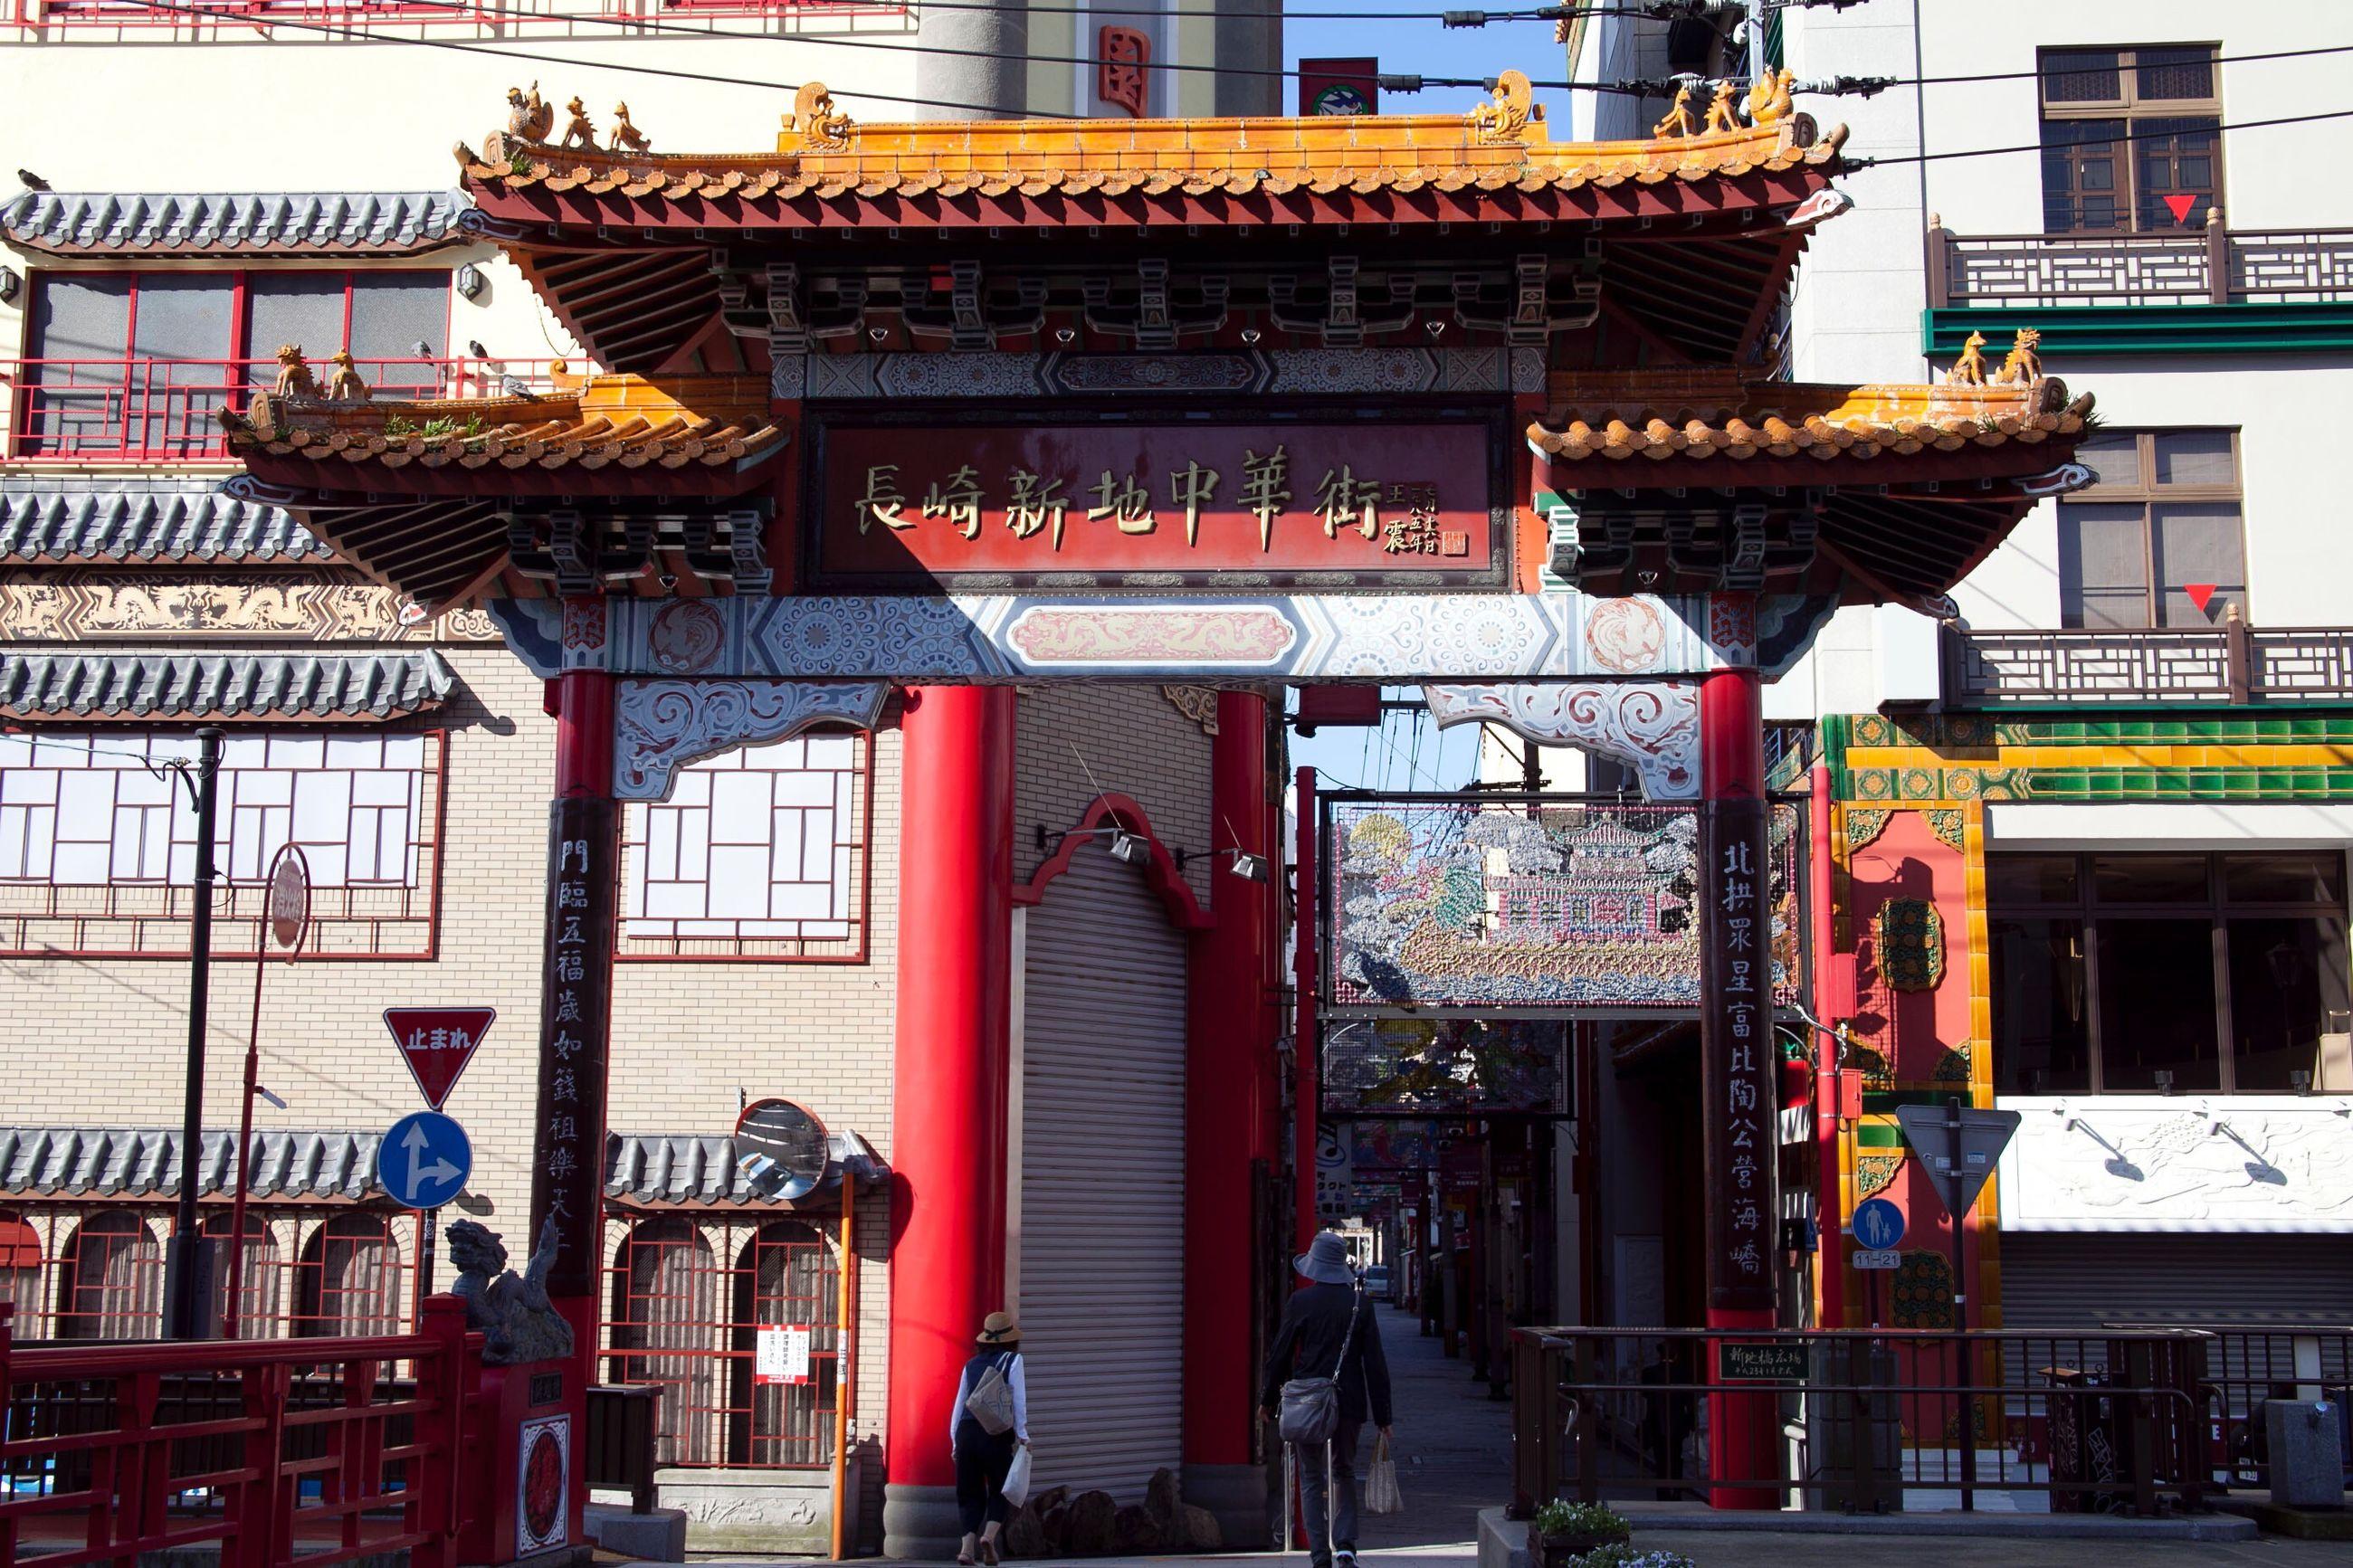 architecture, entrance, cultures, city, non-western script, travel destinations, built structure, building exterior, text, sky, day, outdoors, people